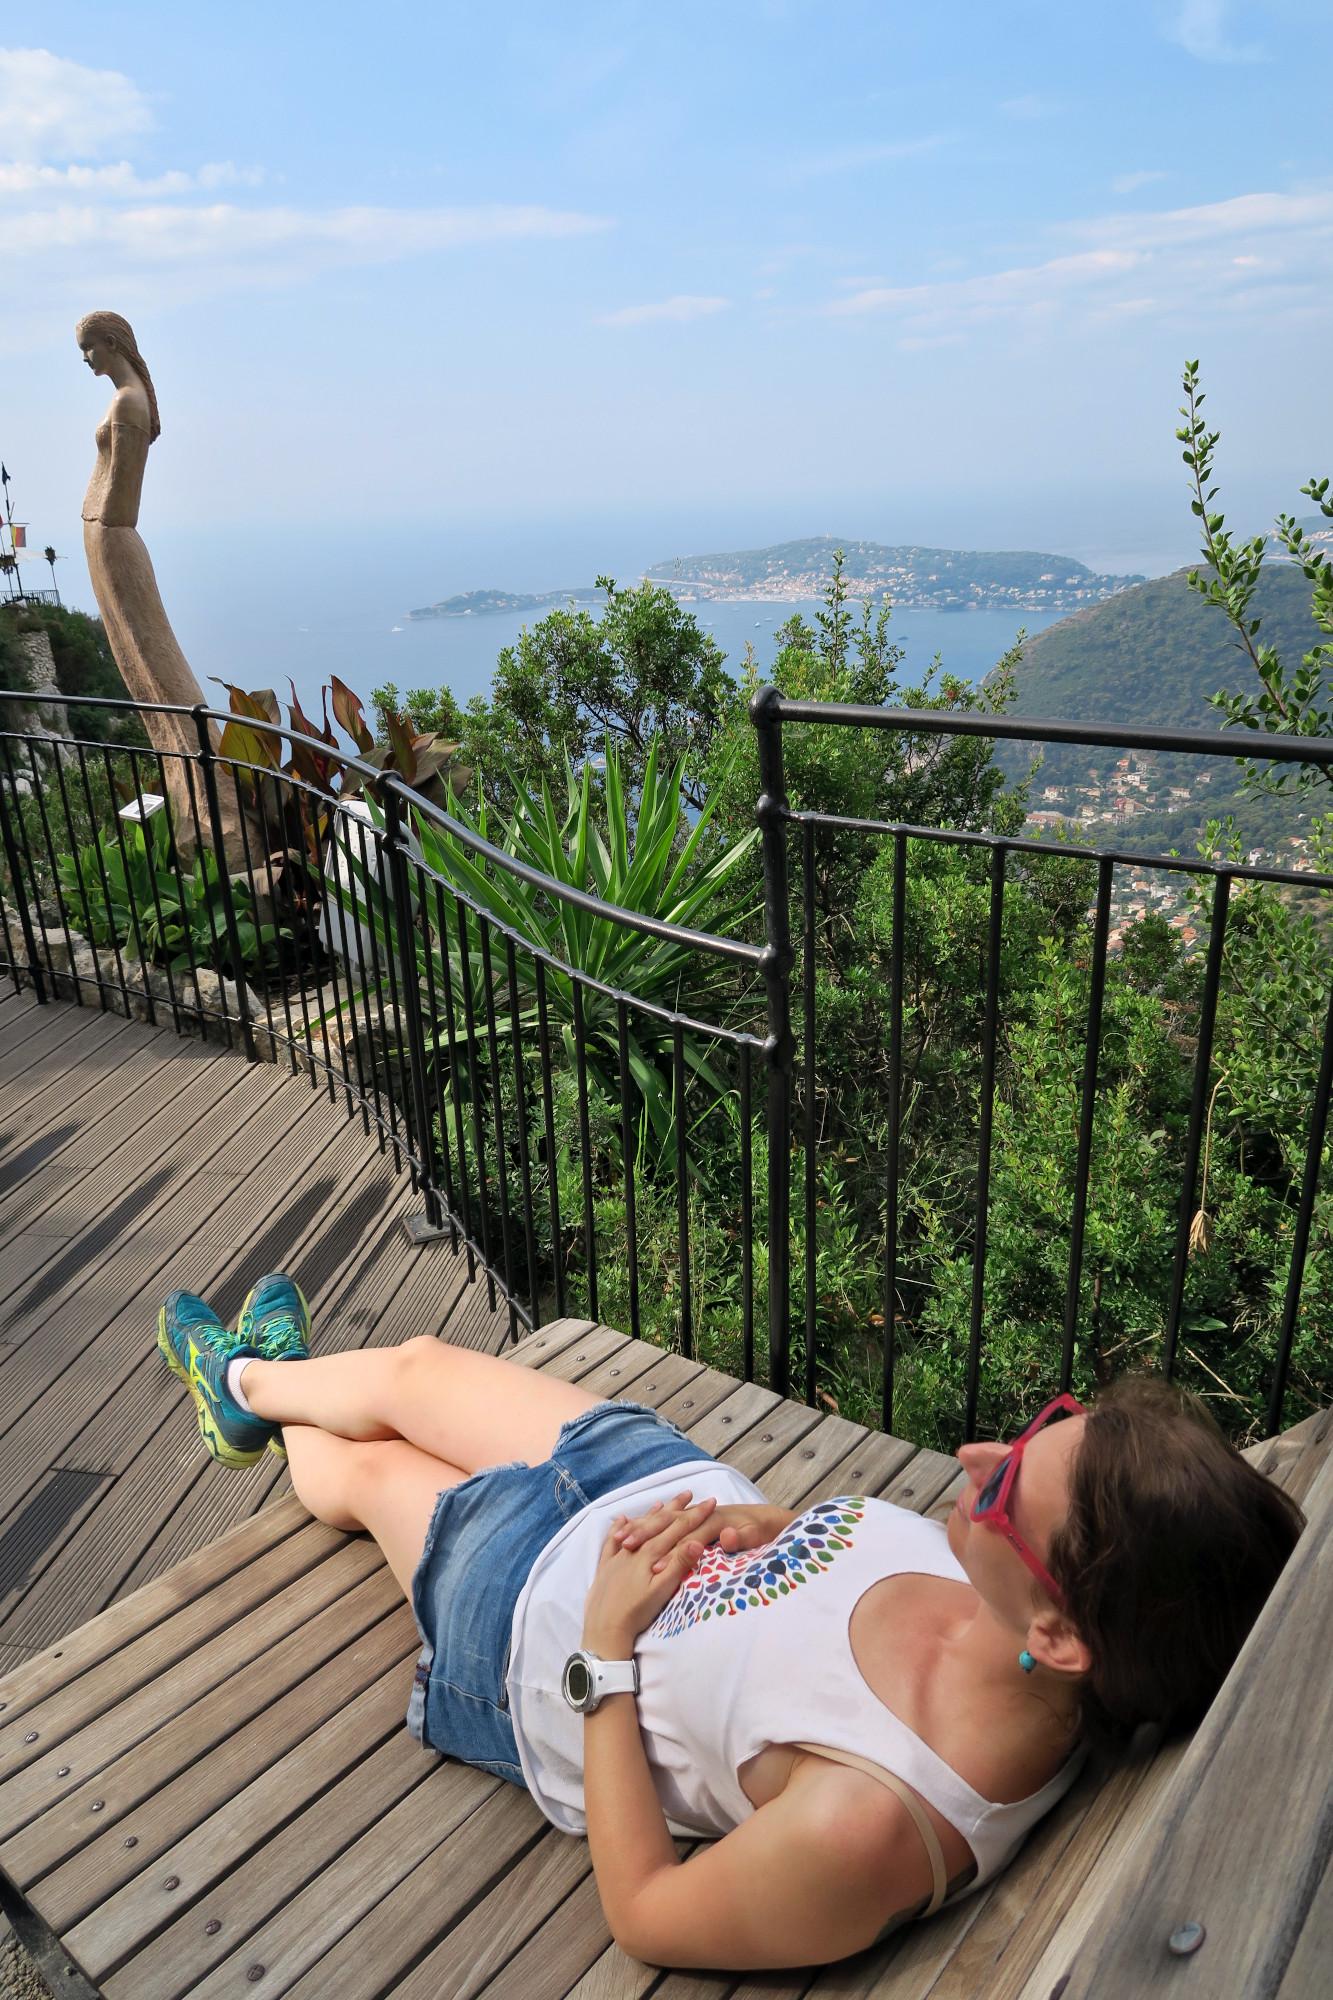 Eze exotic garden French Riviera